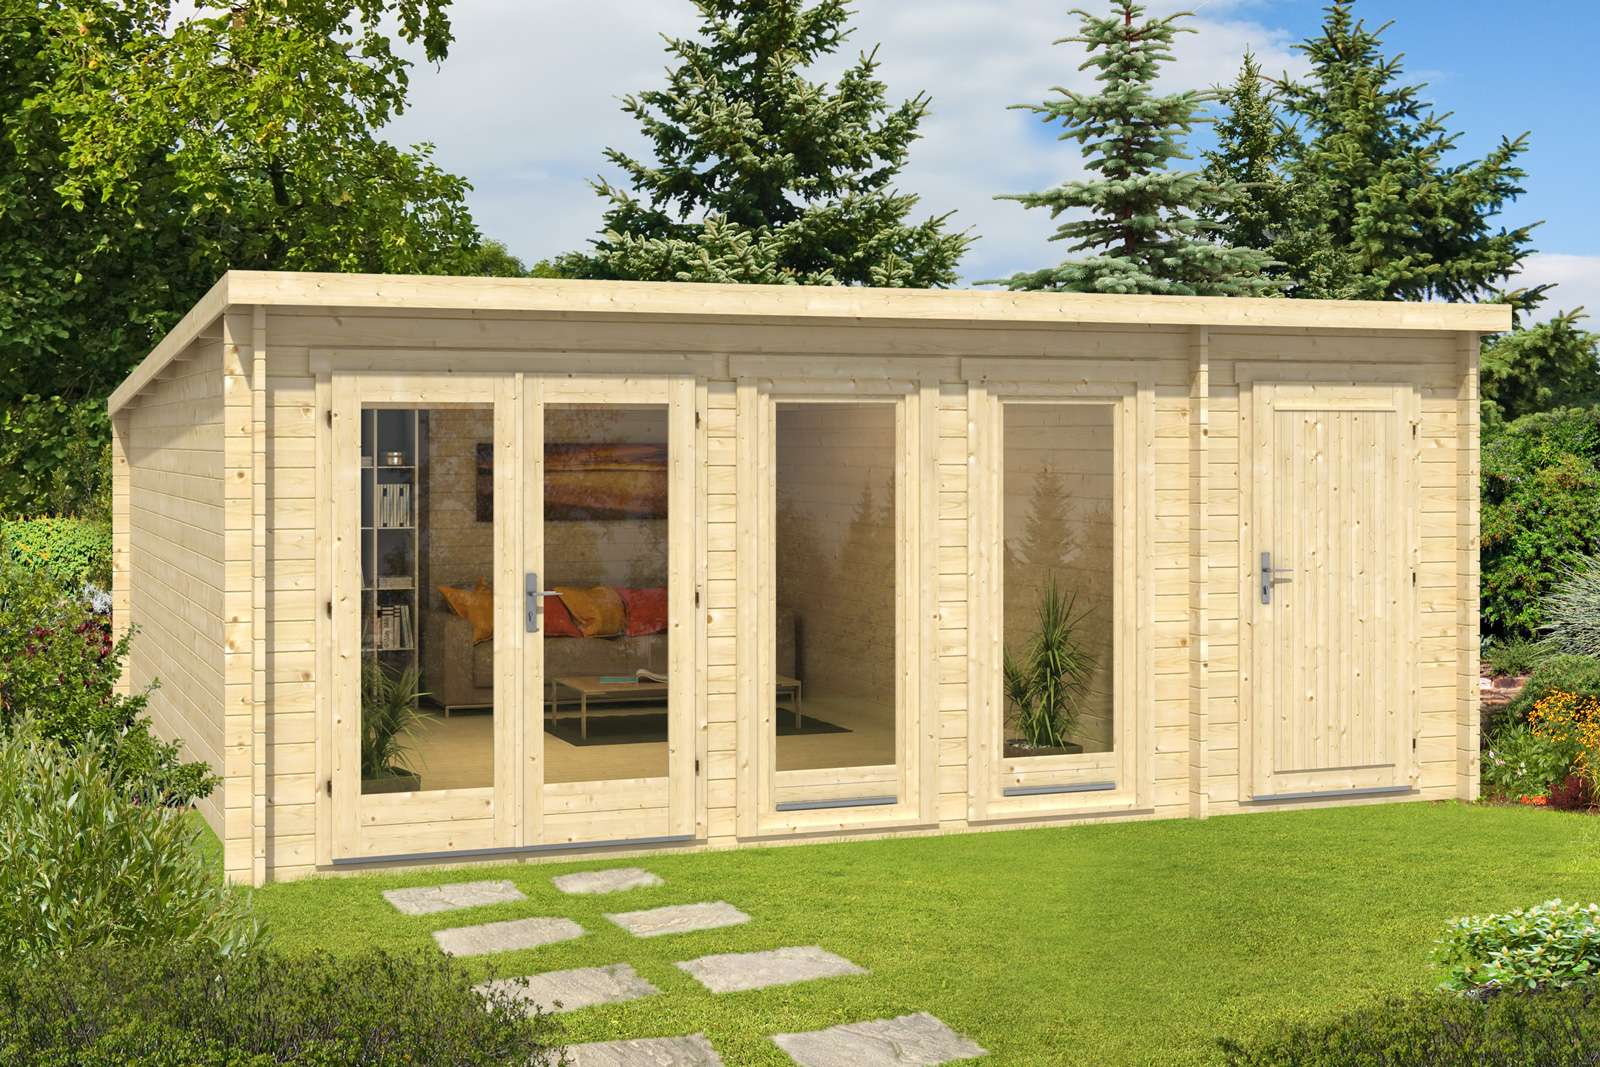 gartenhaus holz 20 qm io98 hitoiro. Black Bedroom Furniture Sets. Home Design Ideas